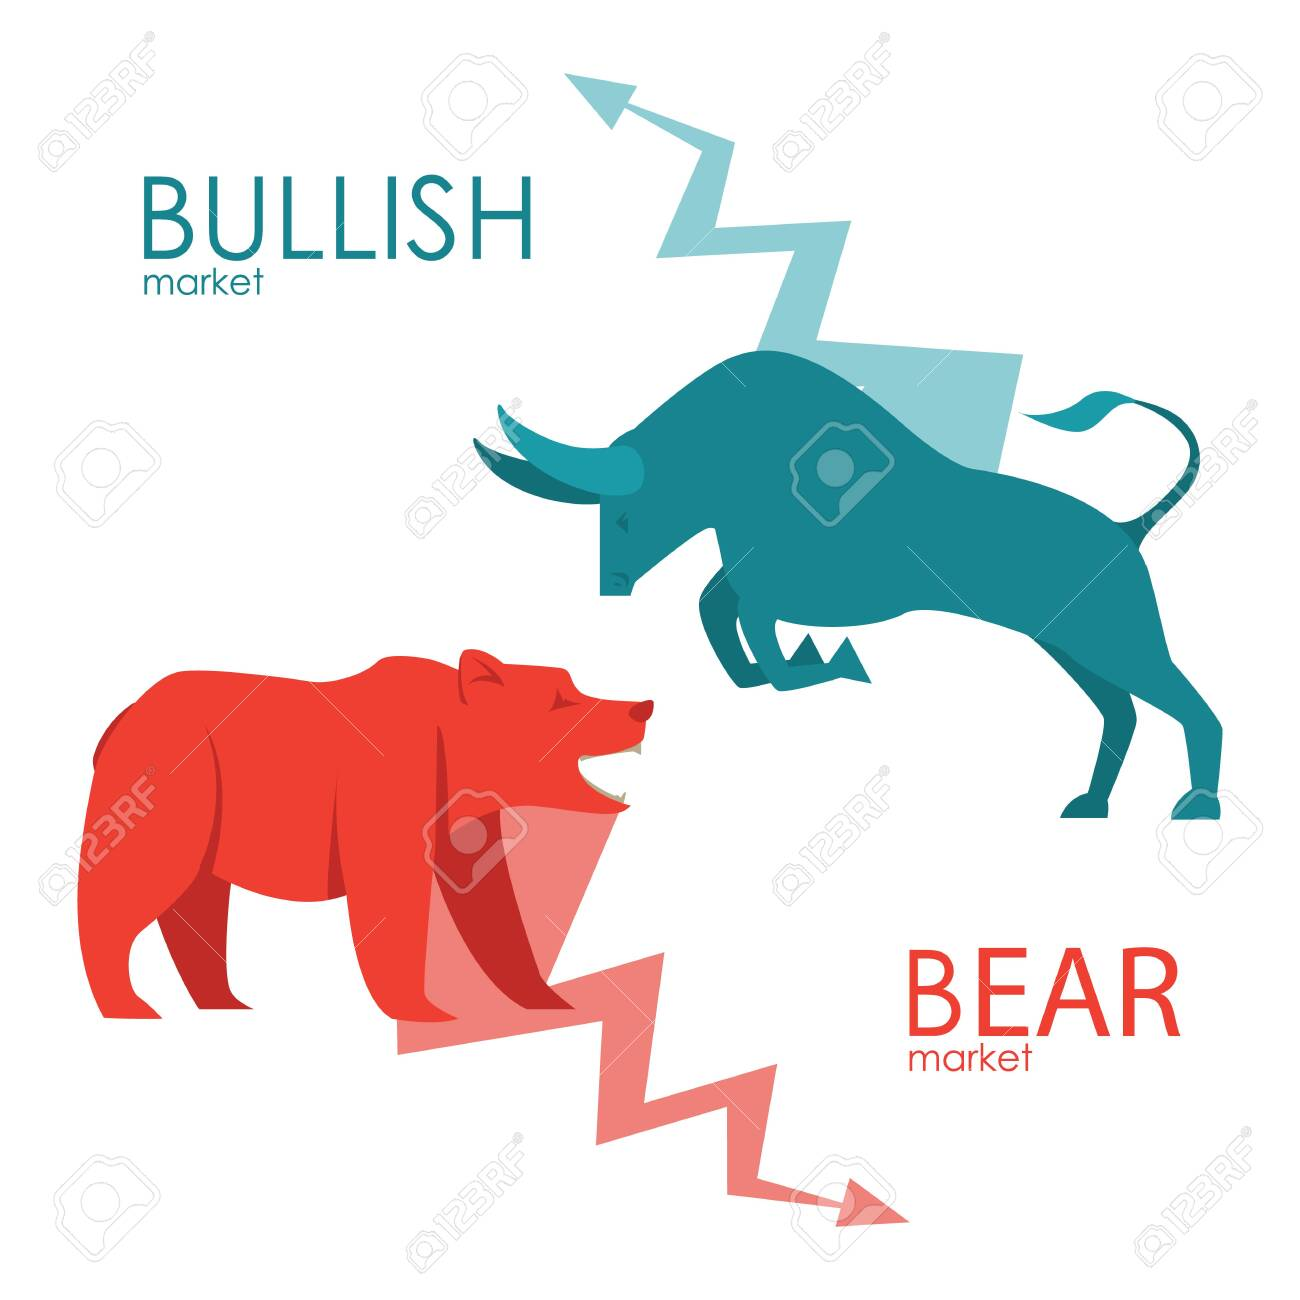 Bearish and bullish market investment definition investopedia